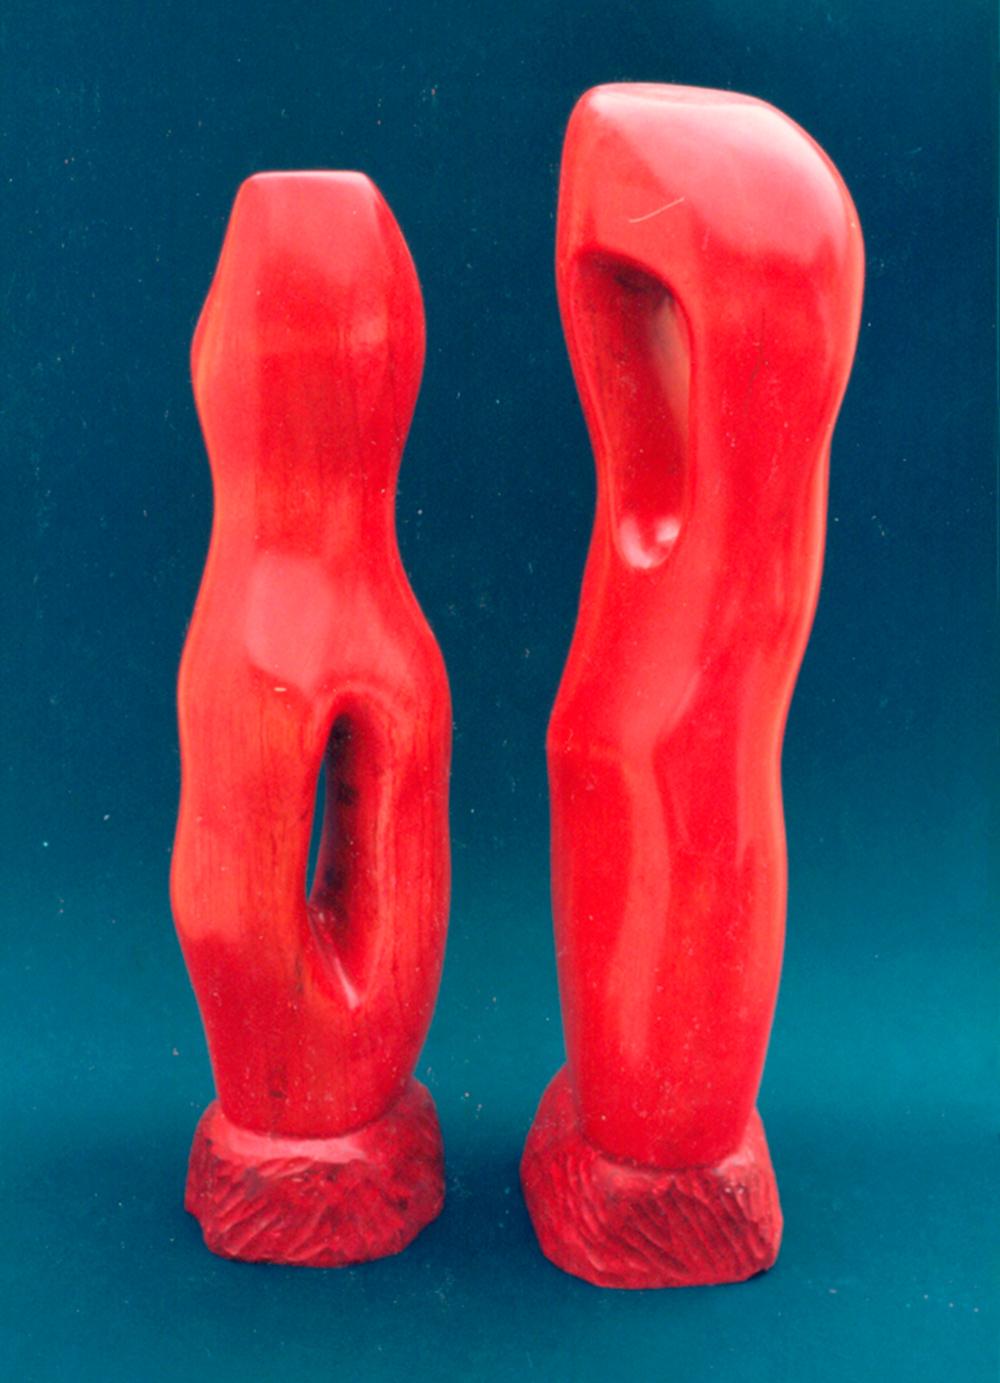 Escultura-Hercules-y-Diana-B-Figurativo-Abstracto-RD.Escultor